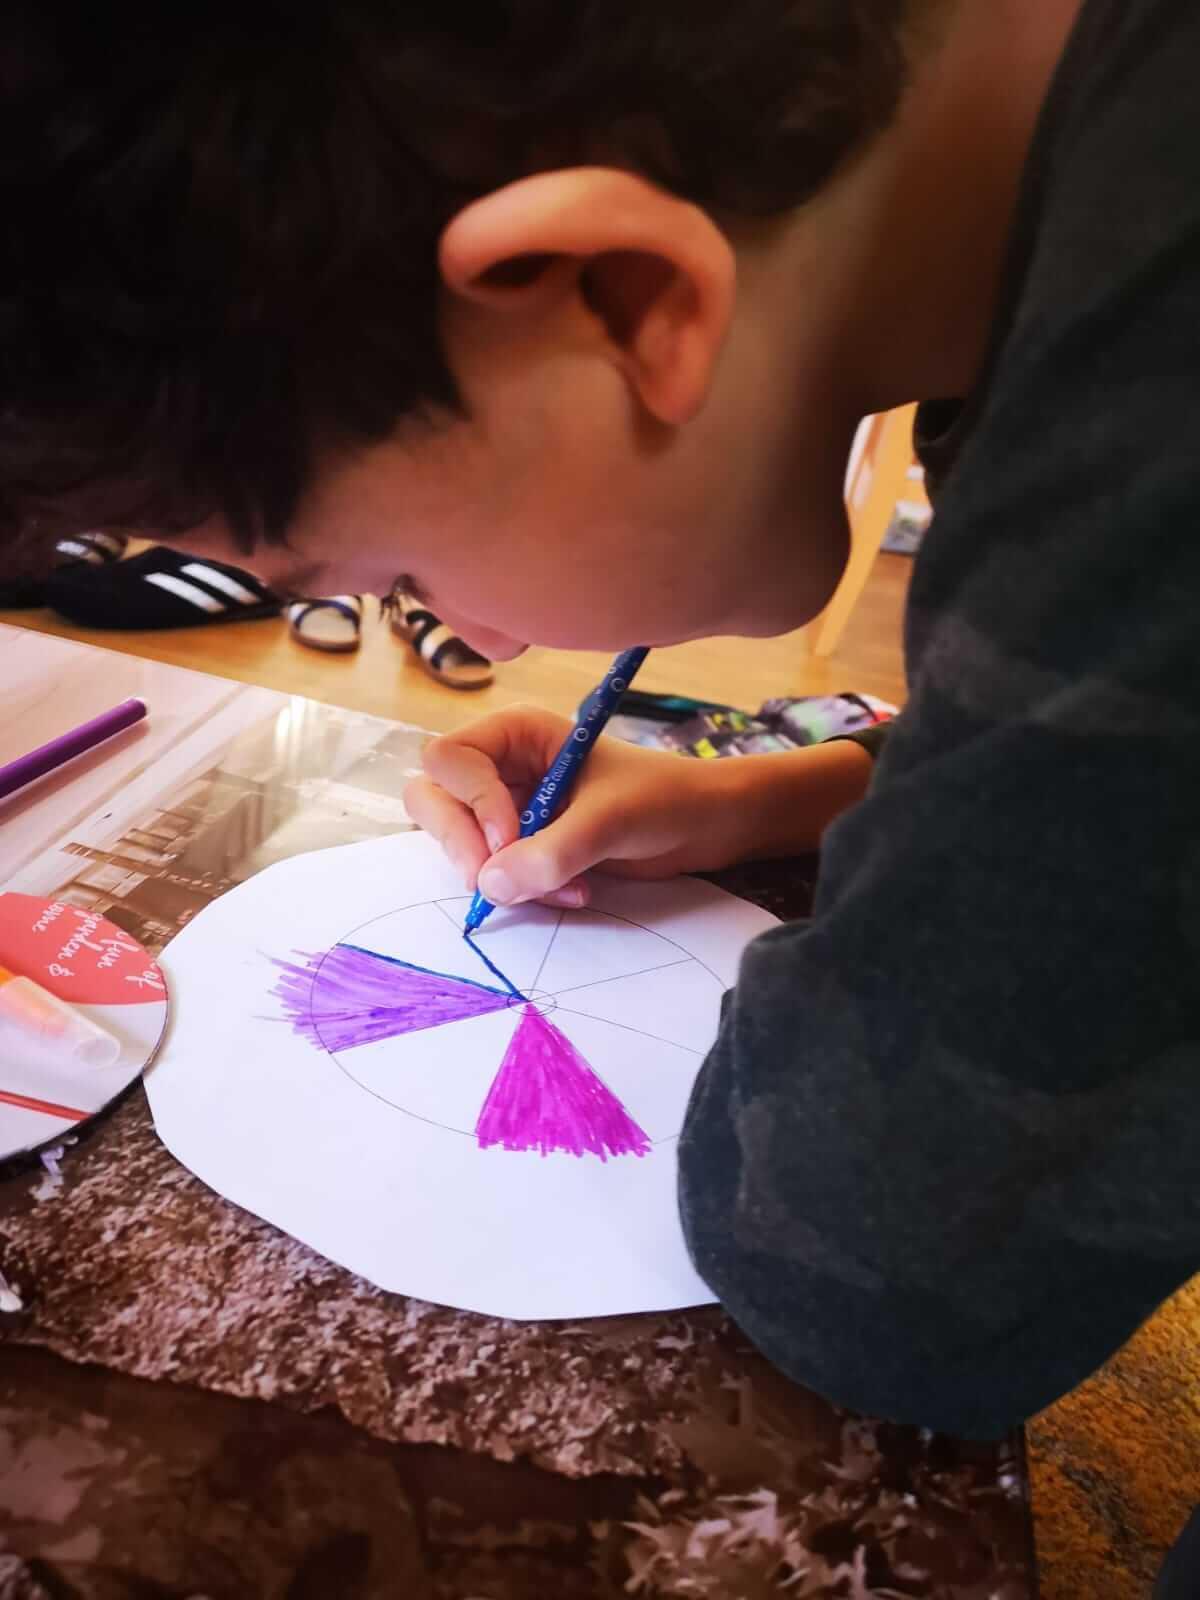 13: Two boys explore craft under lockdown.